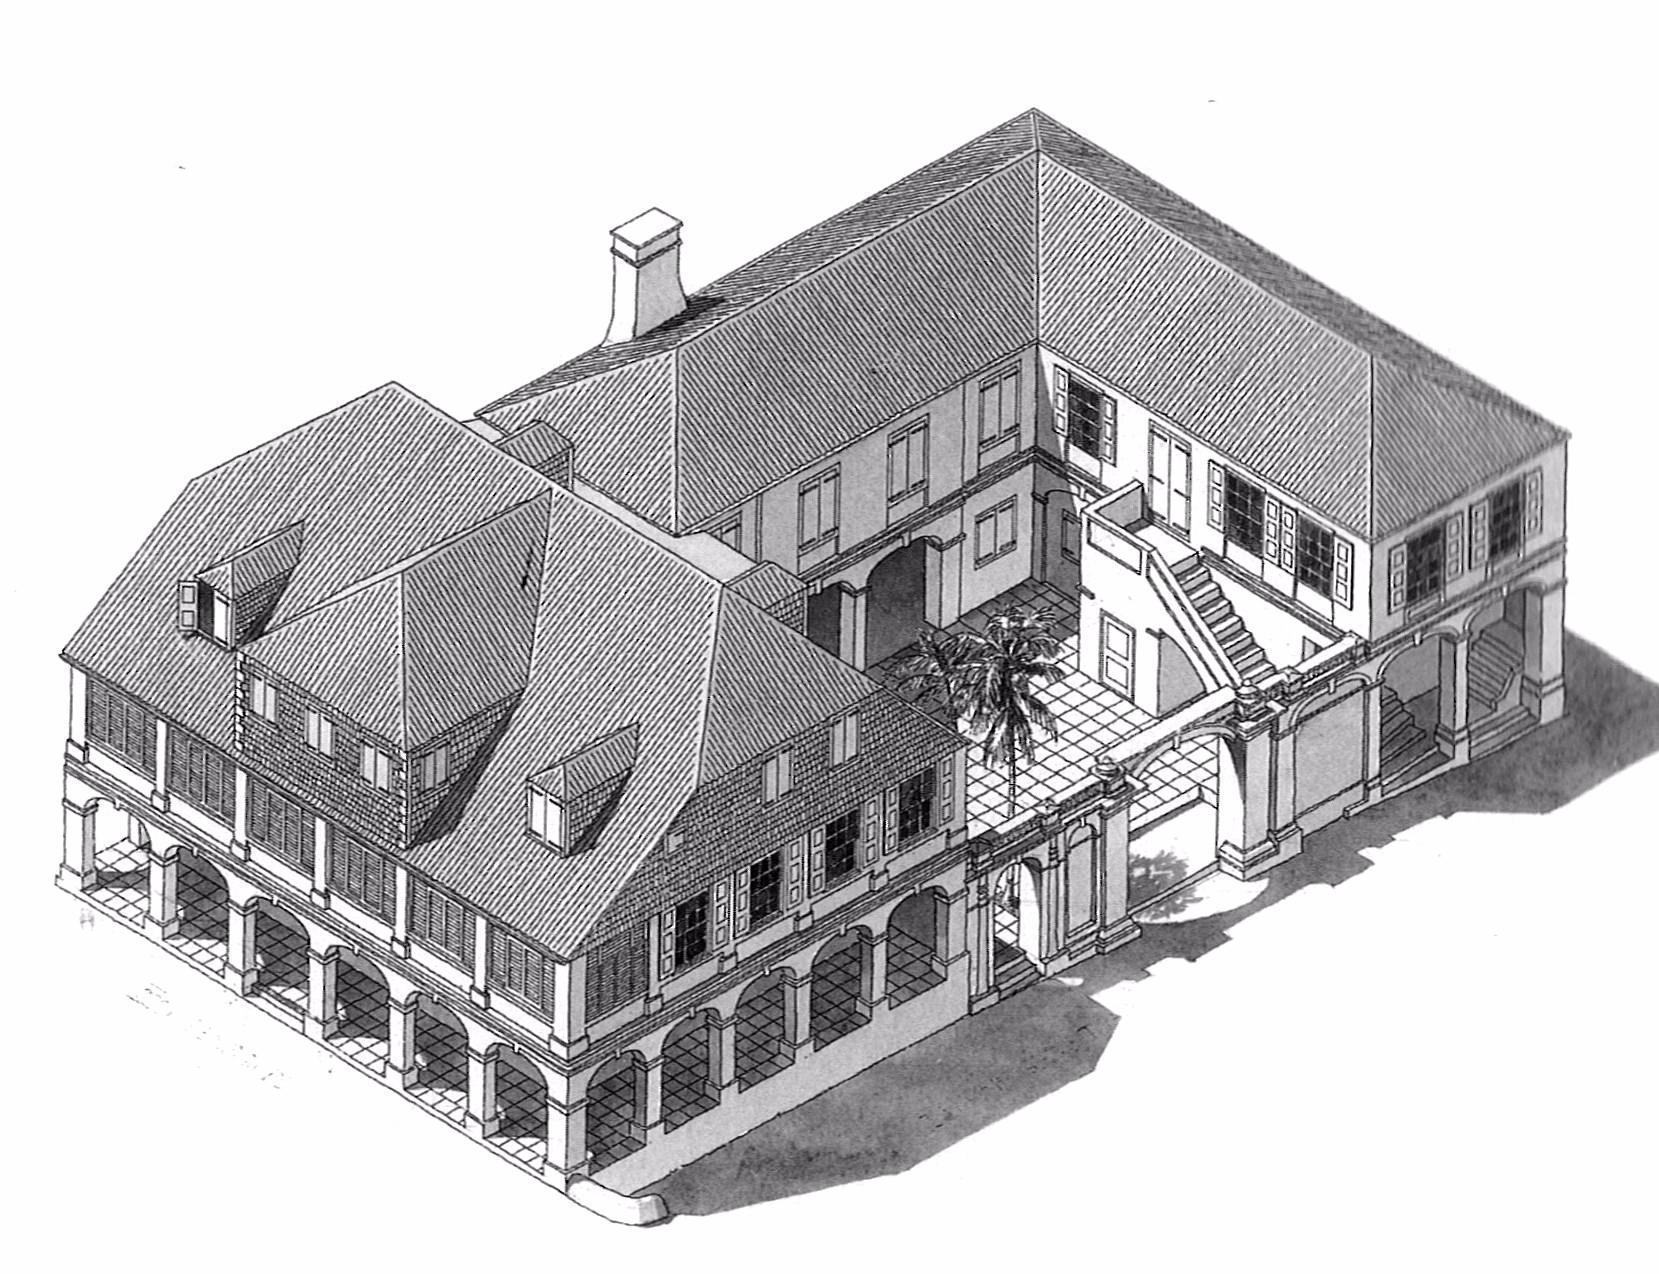 Old Sketch of 52 King street